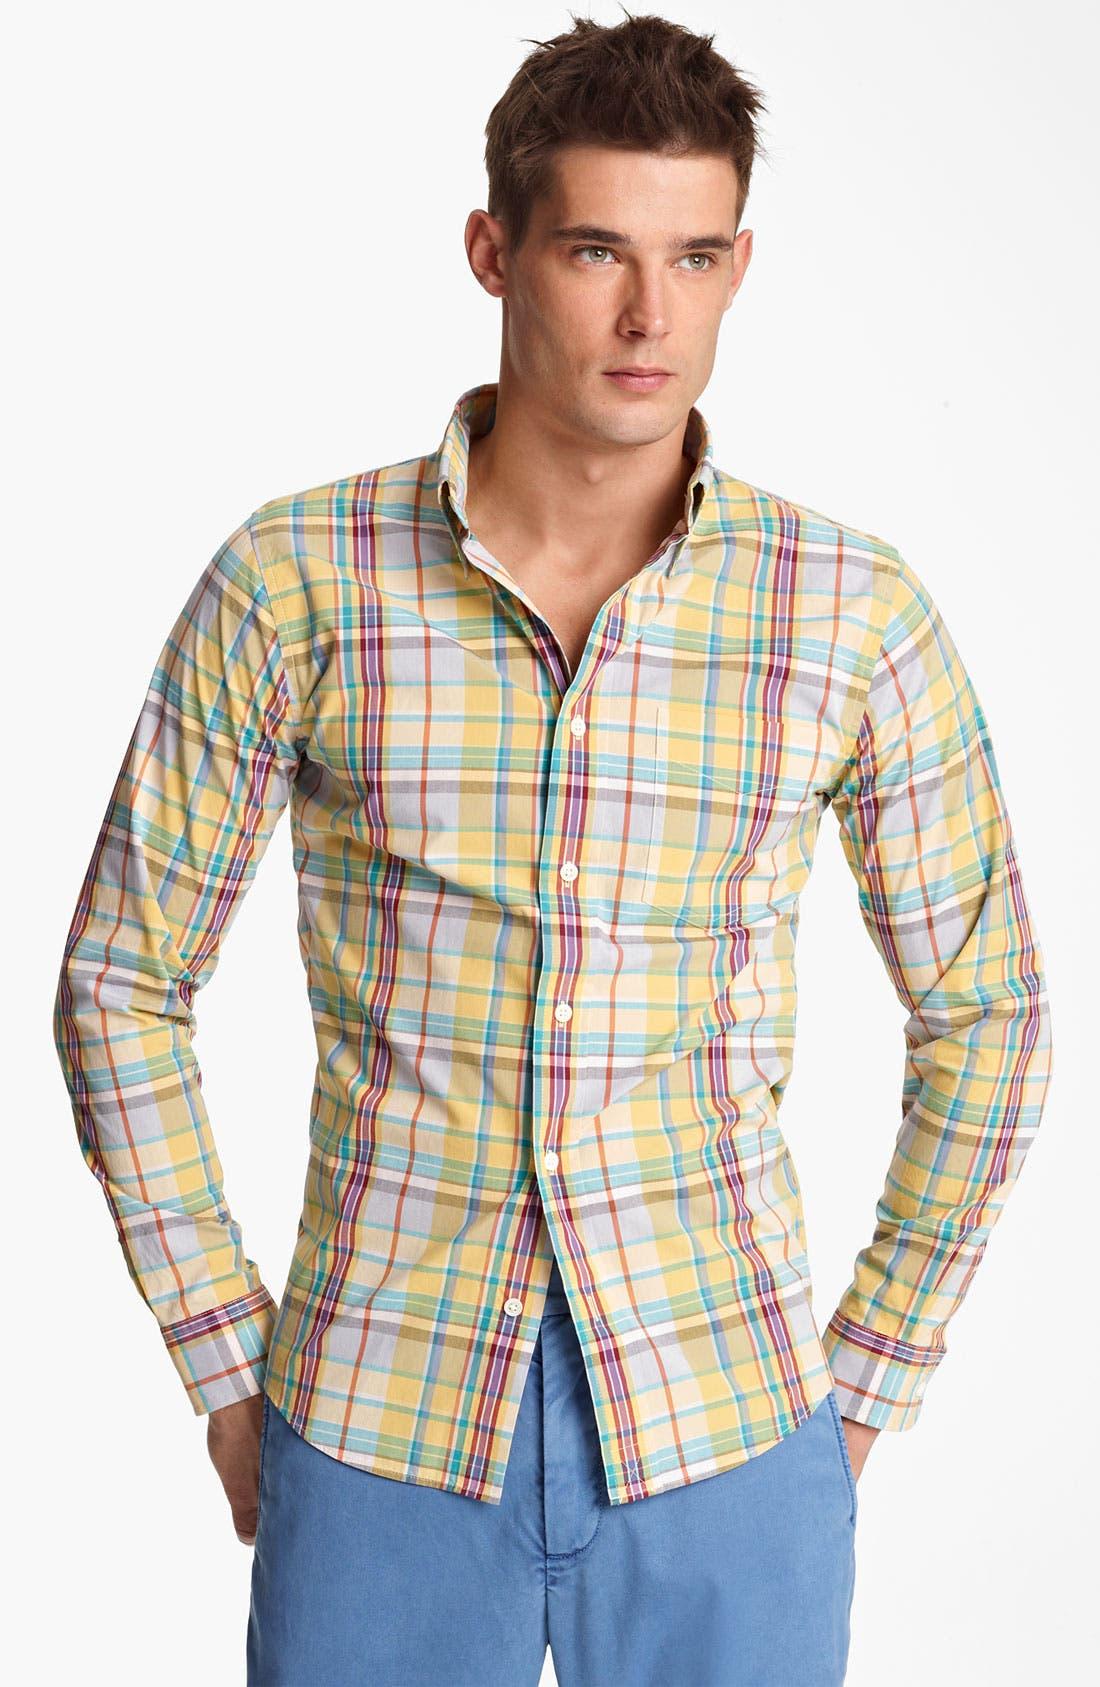 Alternate Image 1 Selected - Jack Spade 'Jasper' Plaid Shirt